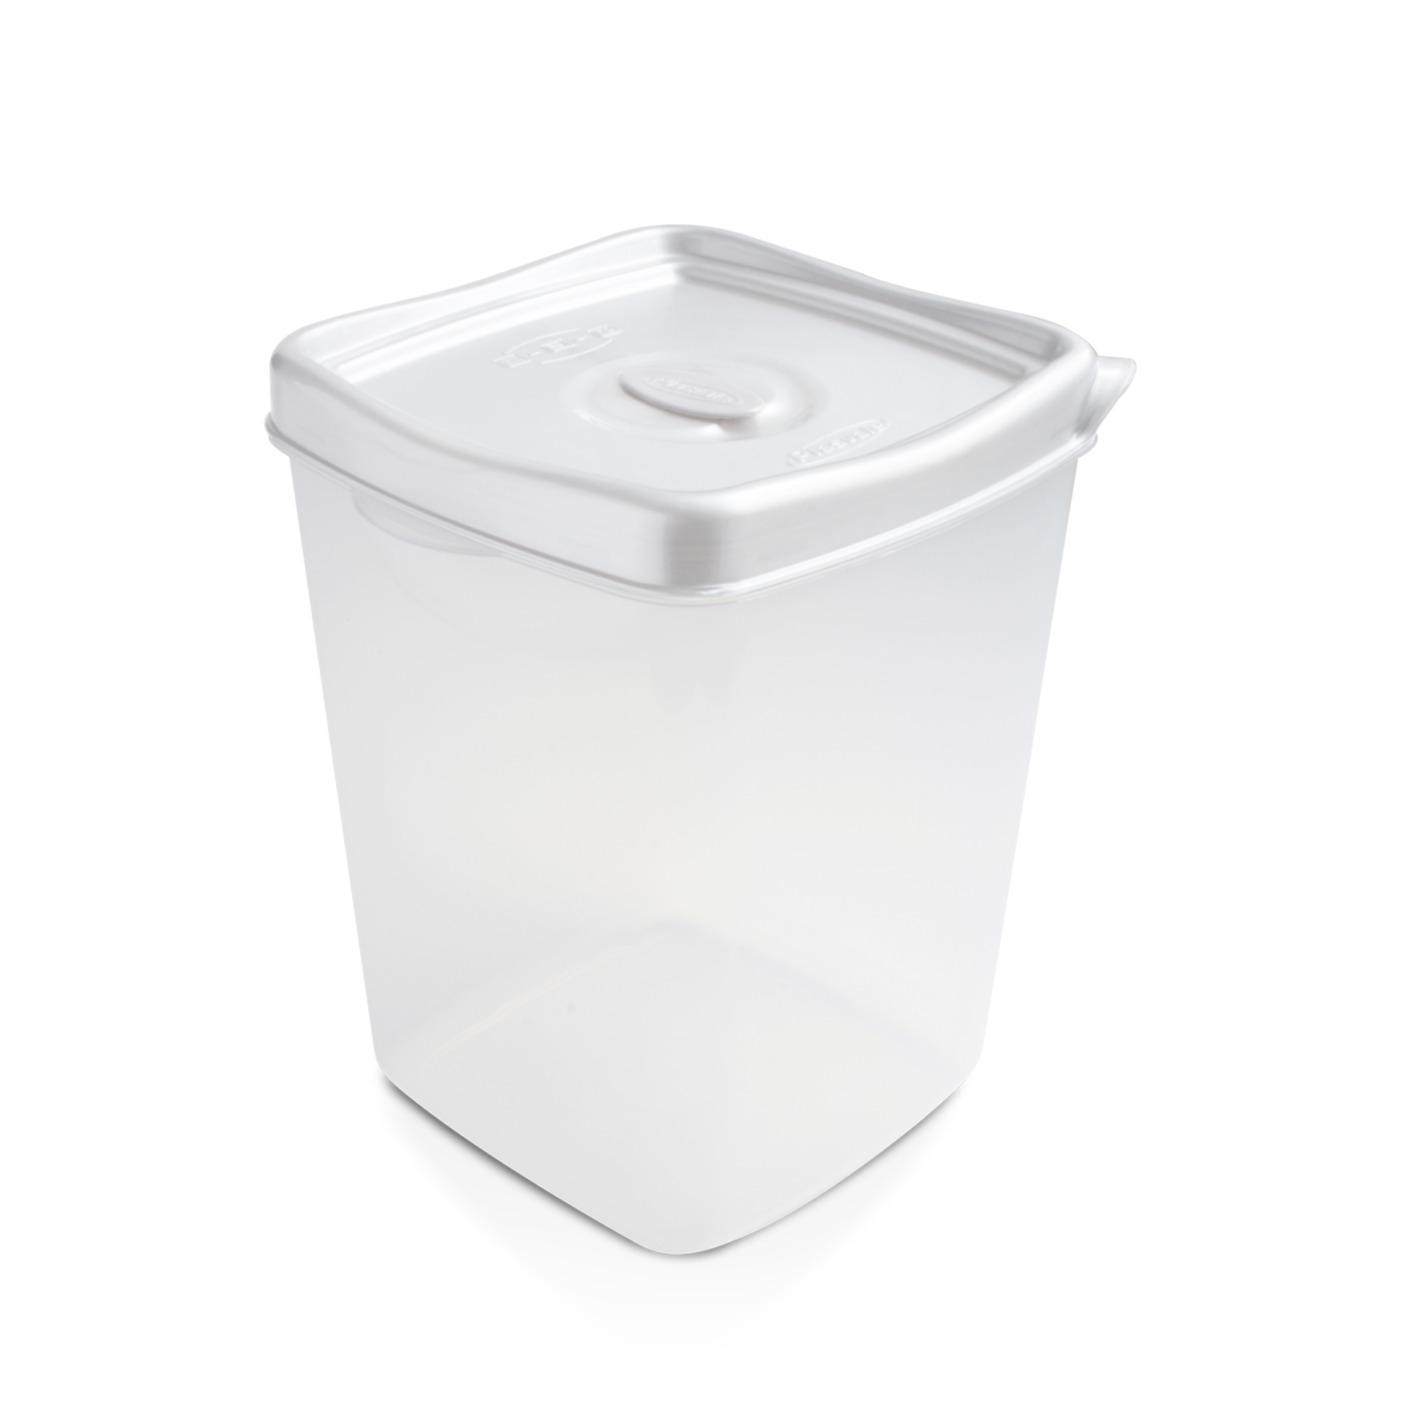 Pote Plastico Hermetico Quadrado 2300L 144x156 cm Branco - Plasvale